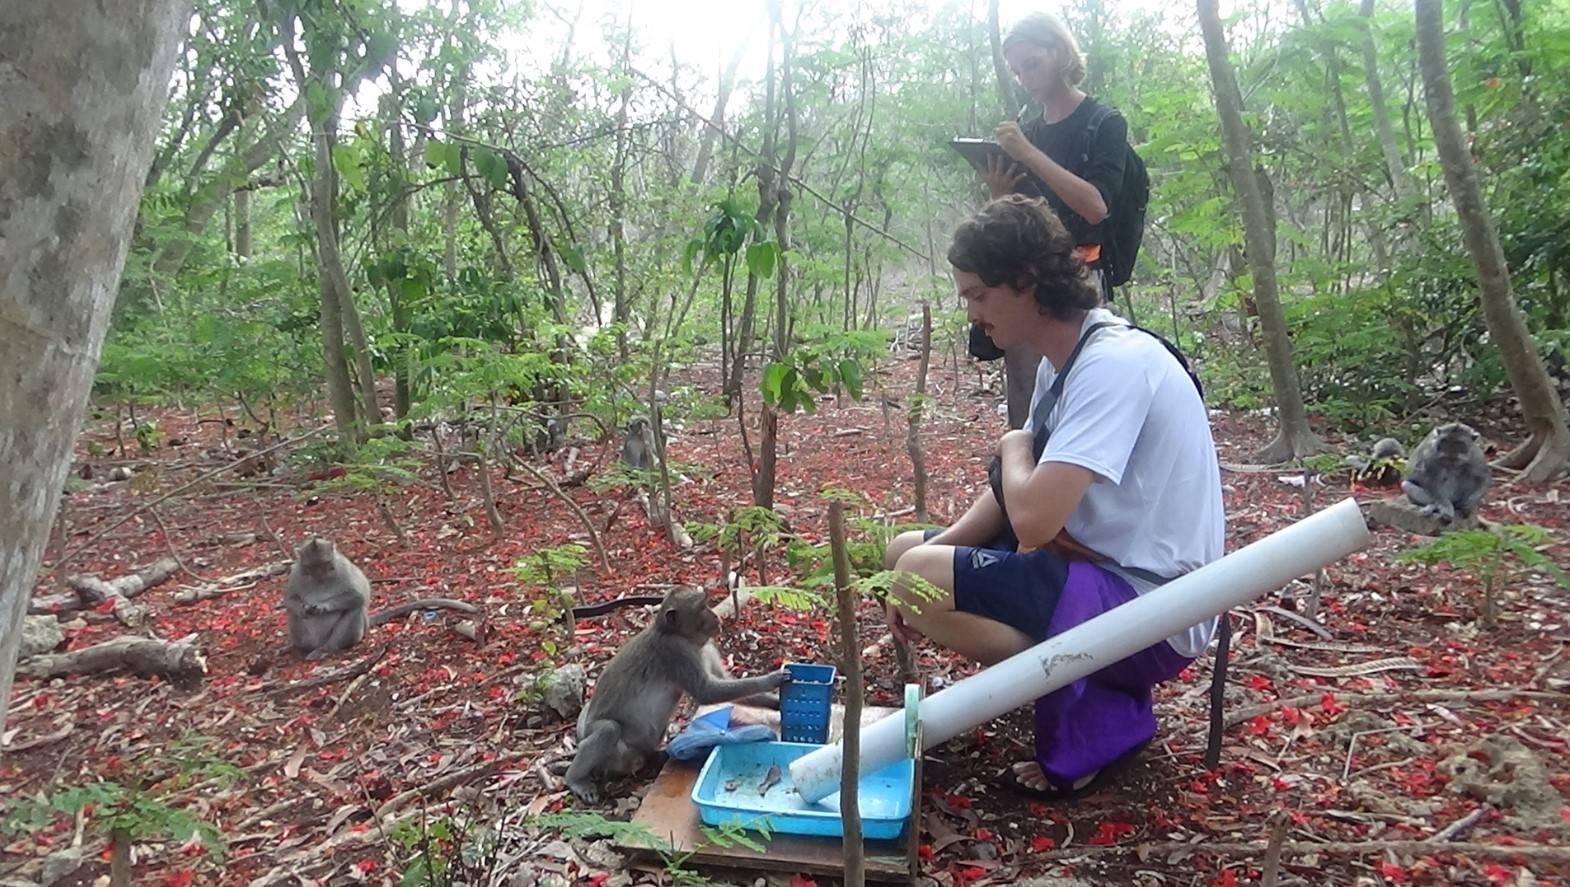 Christian Dunn and Caleb Bunselmeyer experimentally inducing bartering in a long-tailed macaque (Uluwatu, Bali, Nov. 2019)